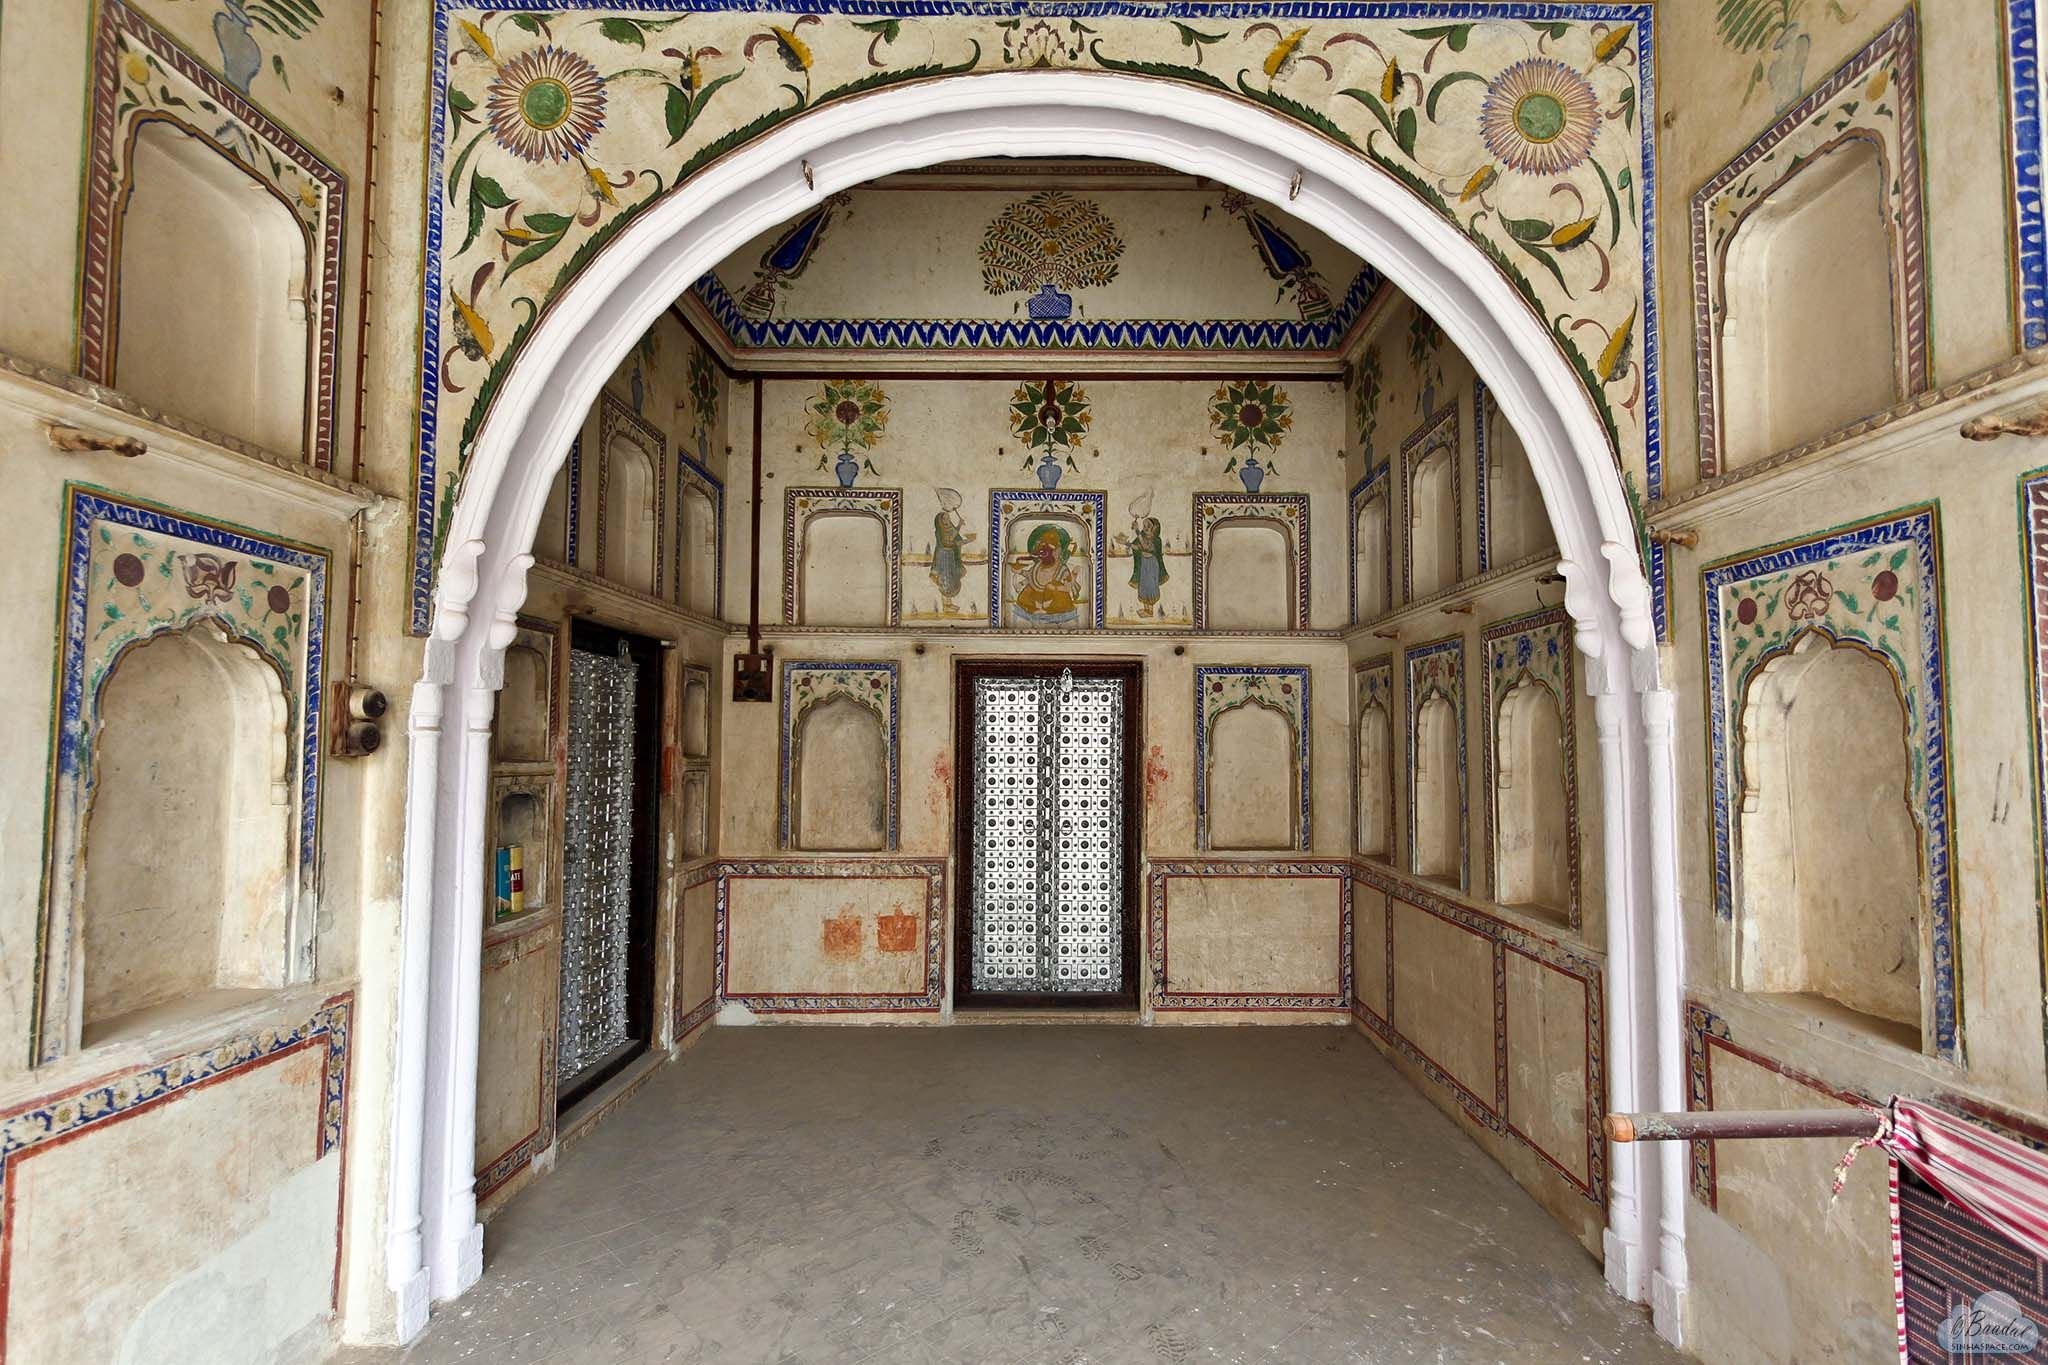 Access corridor to the rooms of Modi Haveli, Jhunjhunu